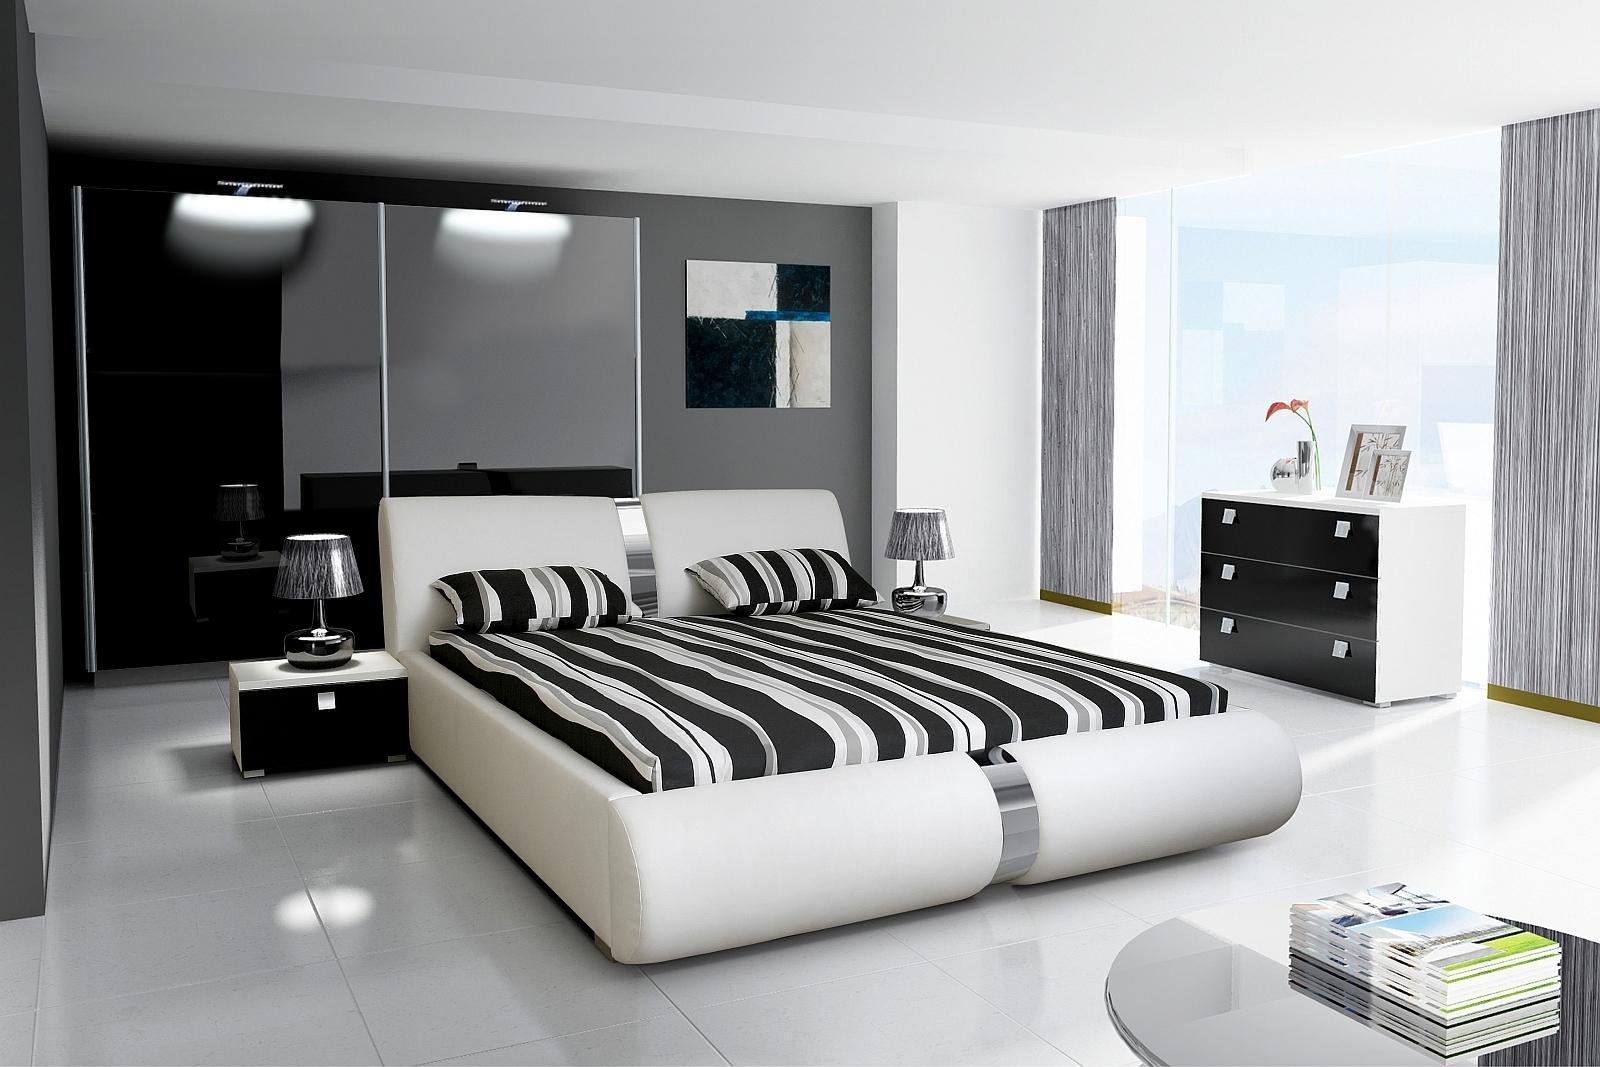 schlafzimmer novalis i hochglanz wei schwarz. Black Bedroom Furniture Sets. Home Design Ideas